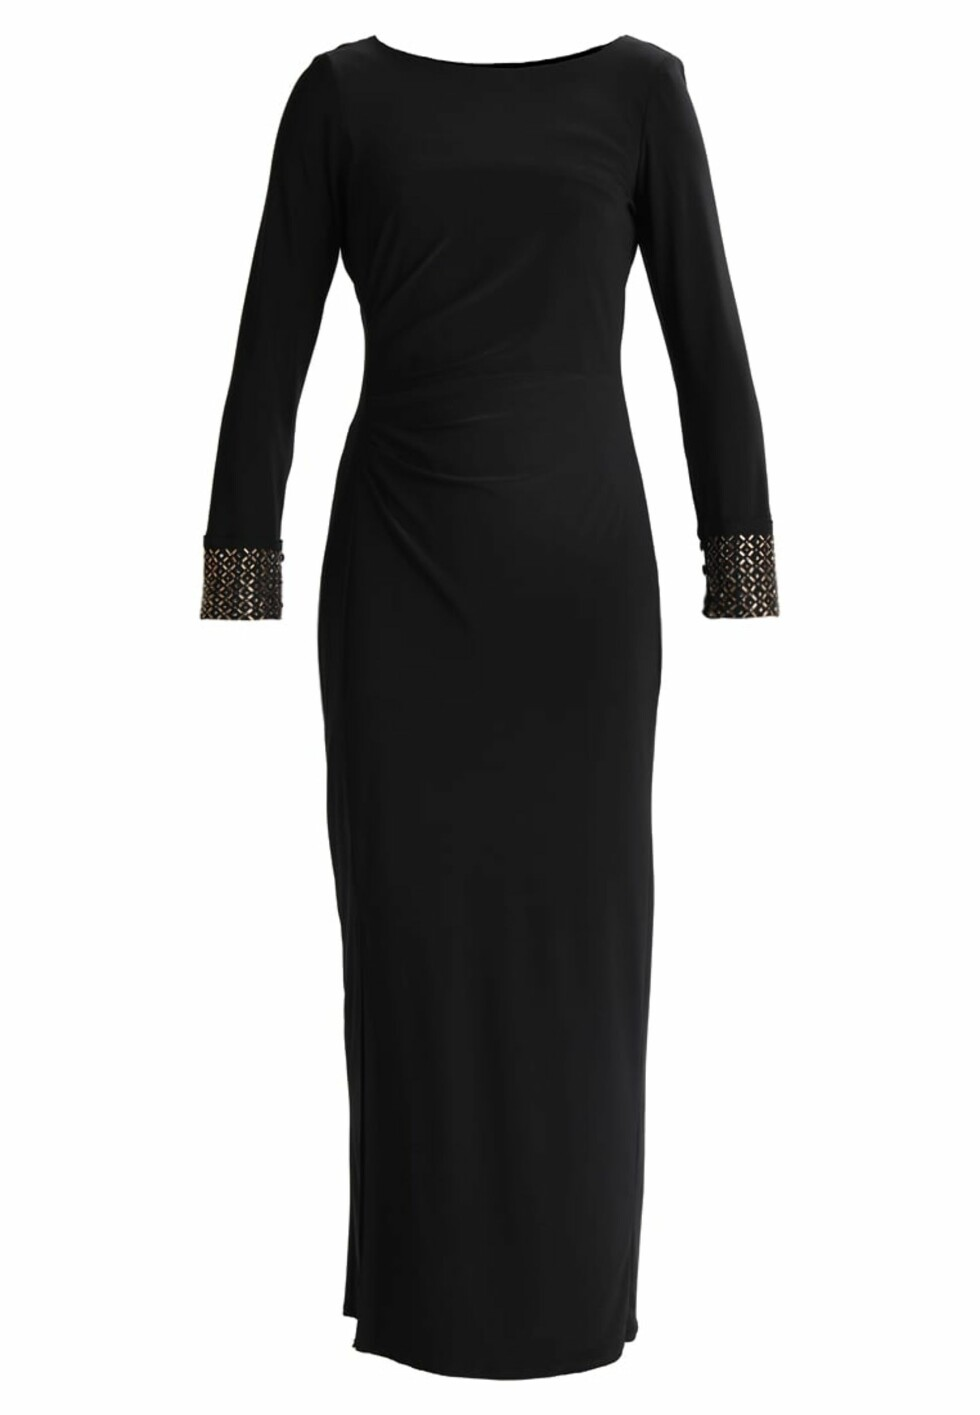 Kjole fra Wallis Petite |749,-| https://www.zalando.no/wallis-petite-moon-rouched-cuff-fotsid-kjole-black-wp021c02t-q11.html